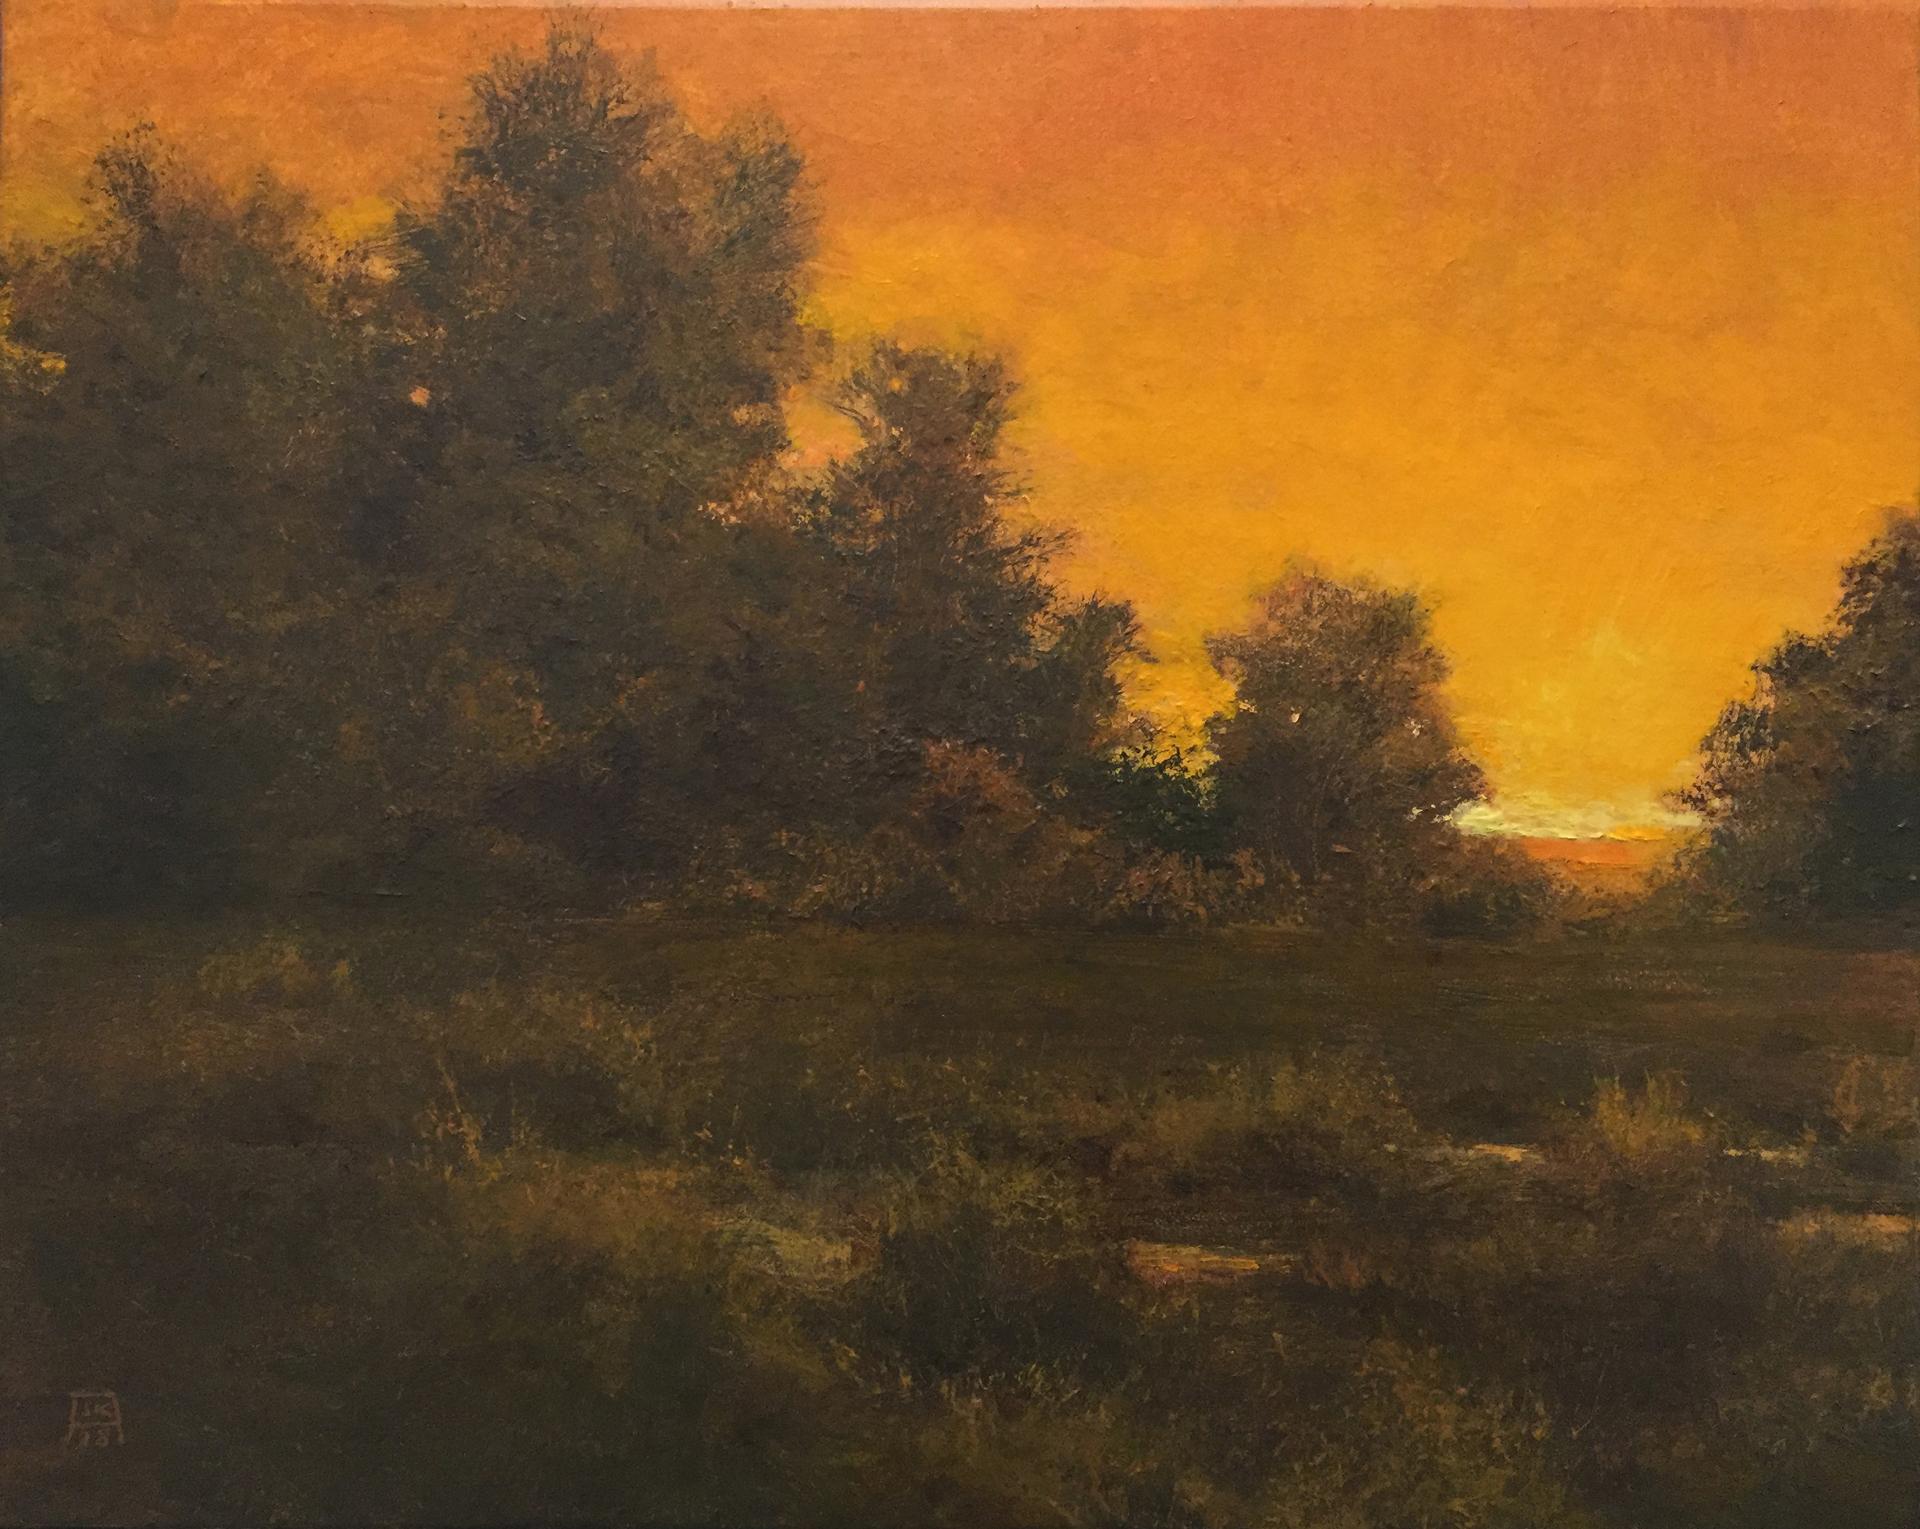 Black Marsh (Sanctus) by Shawn Krueger